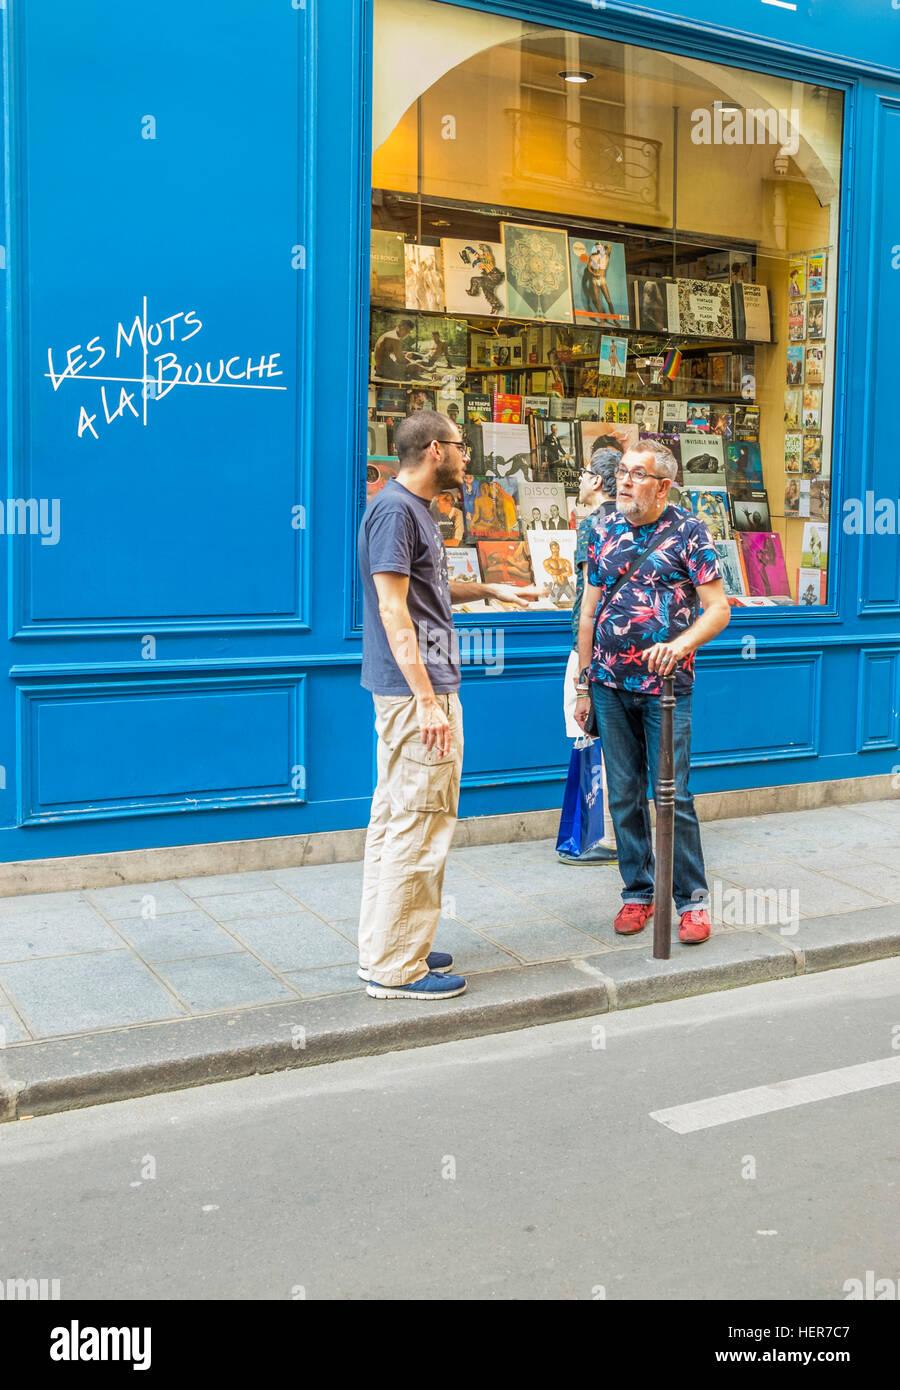 street scene in front of les mots a la bouche, gay bookstore - Stock Image